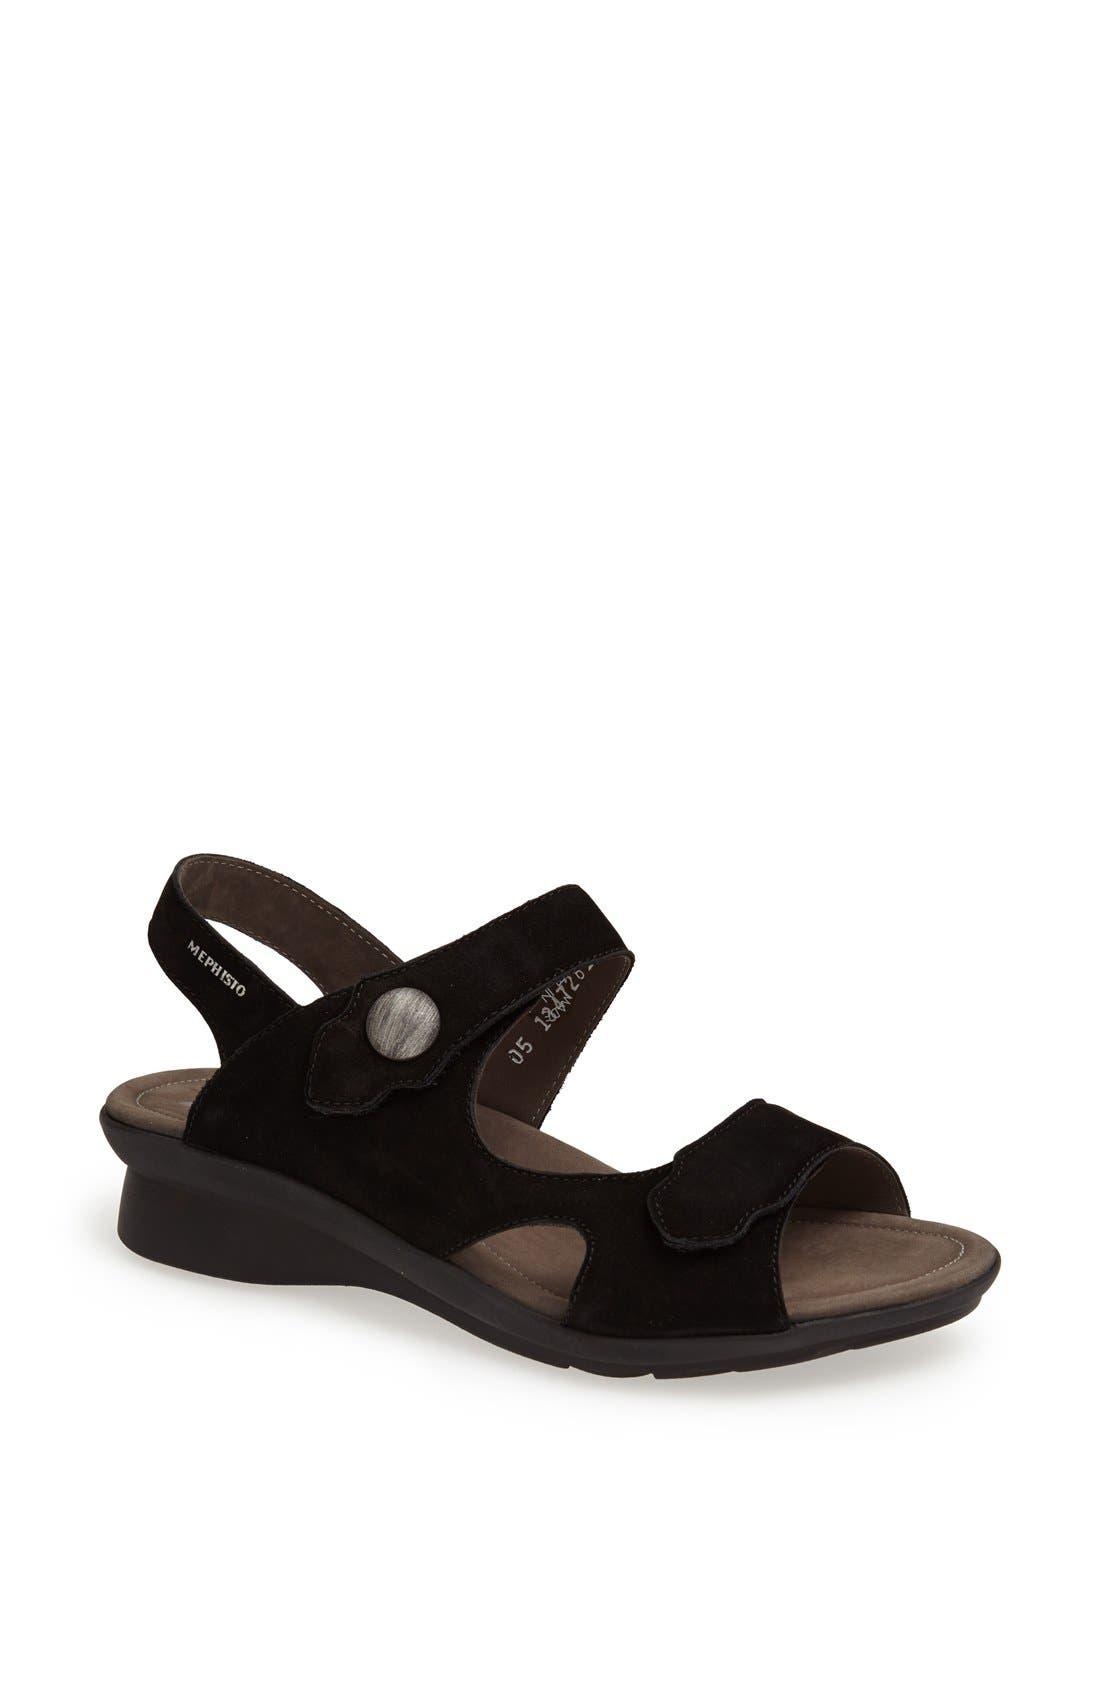 'Prudy' Leather Sandal,                         Main,                         color, BLACK NUBUCK LEATHER